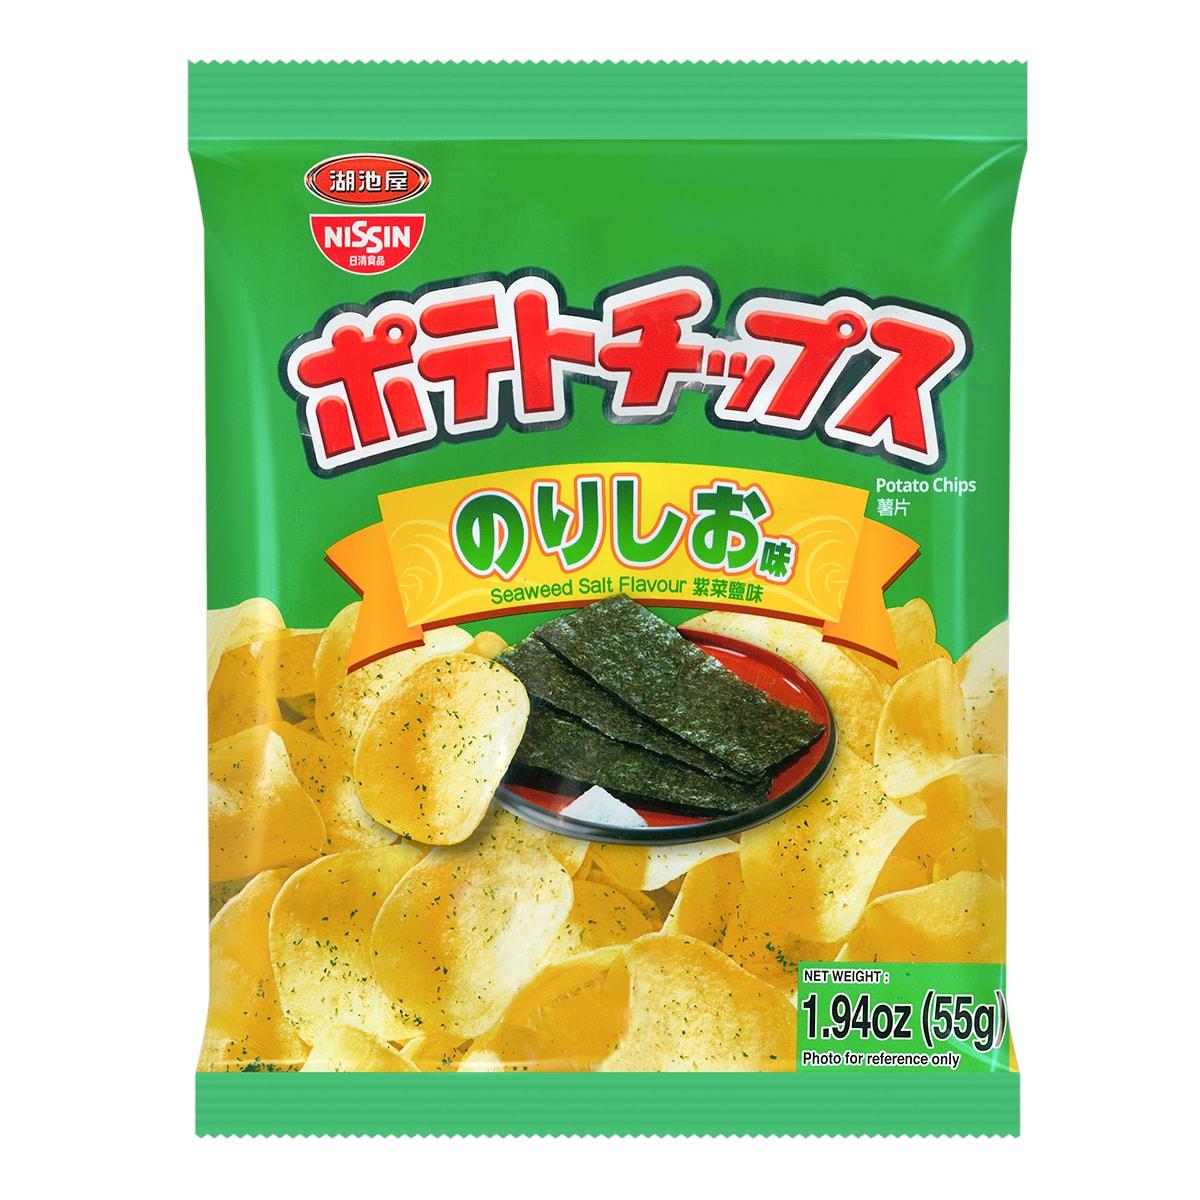 NISSIN Potato Chips Seaweed Salt Flavor 55g